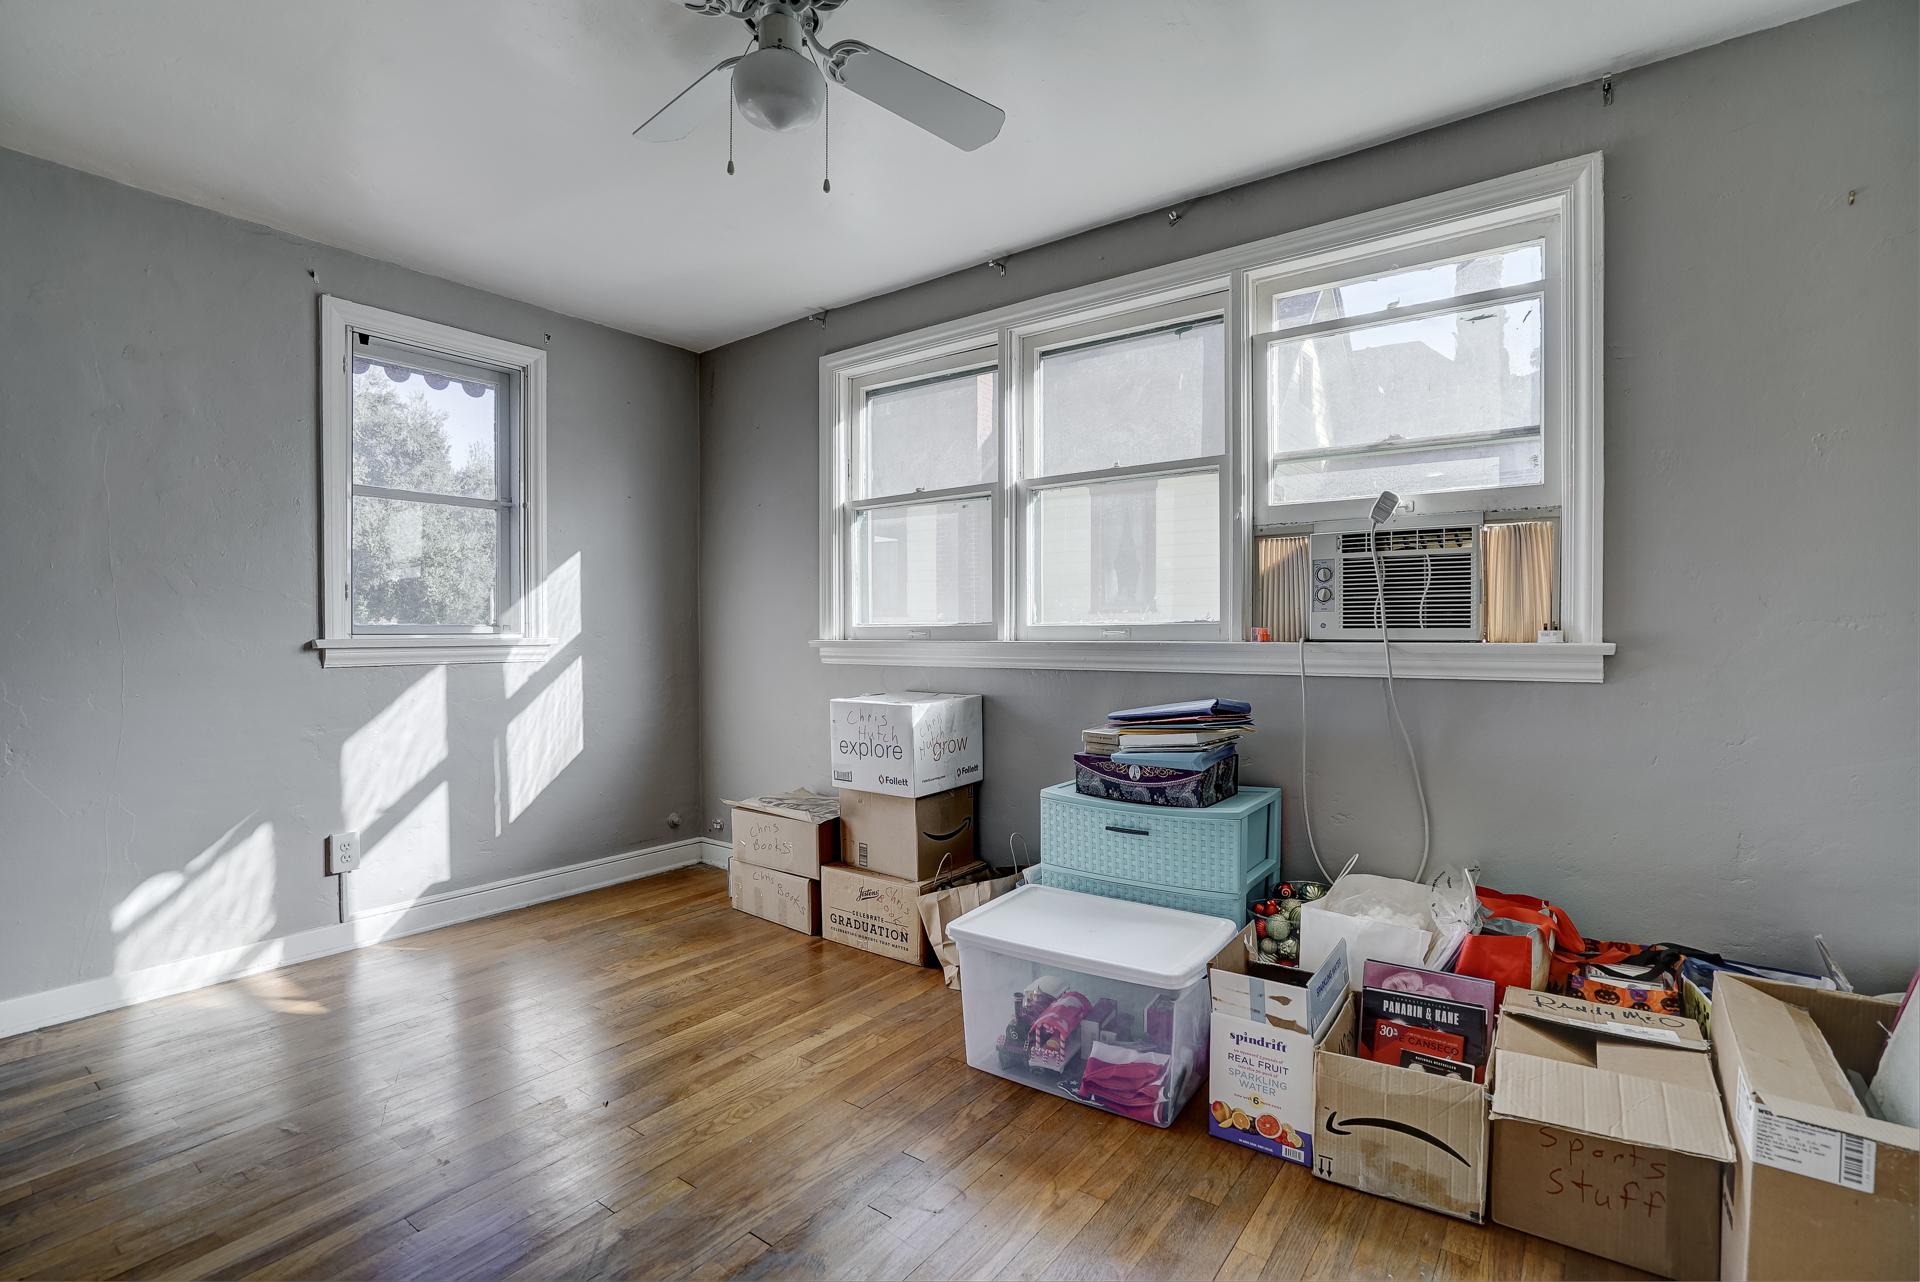 Upstairs bedroom with private half bath and original hardwood floors.